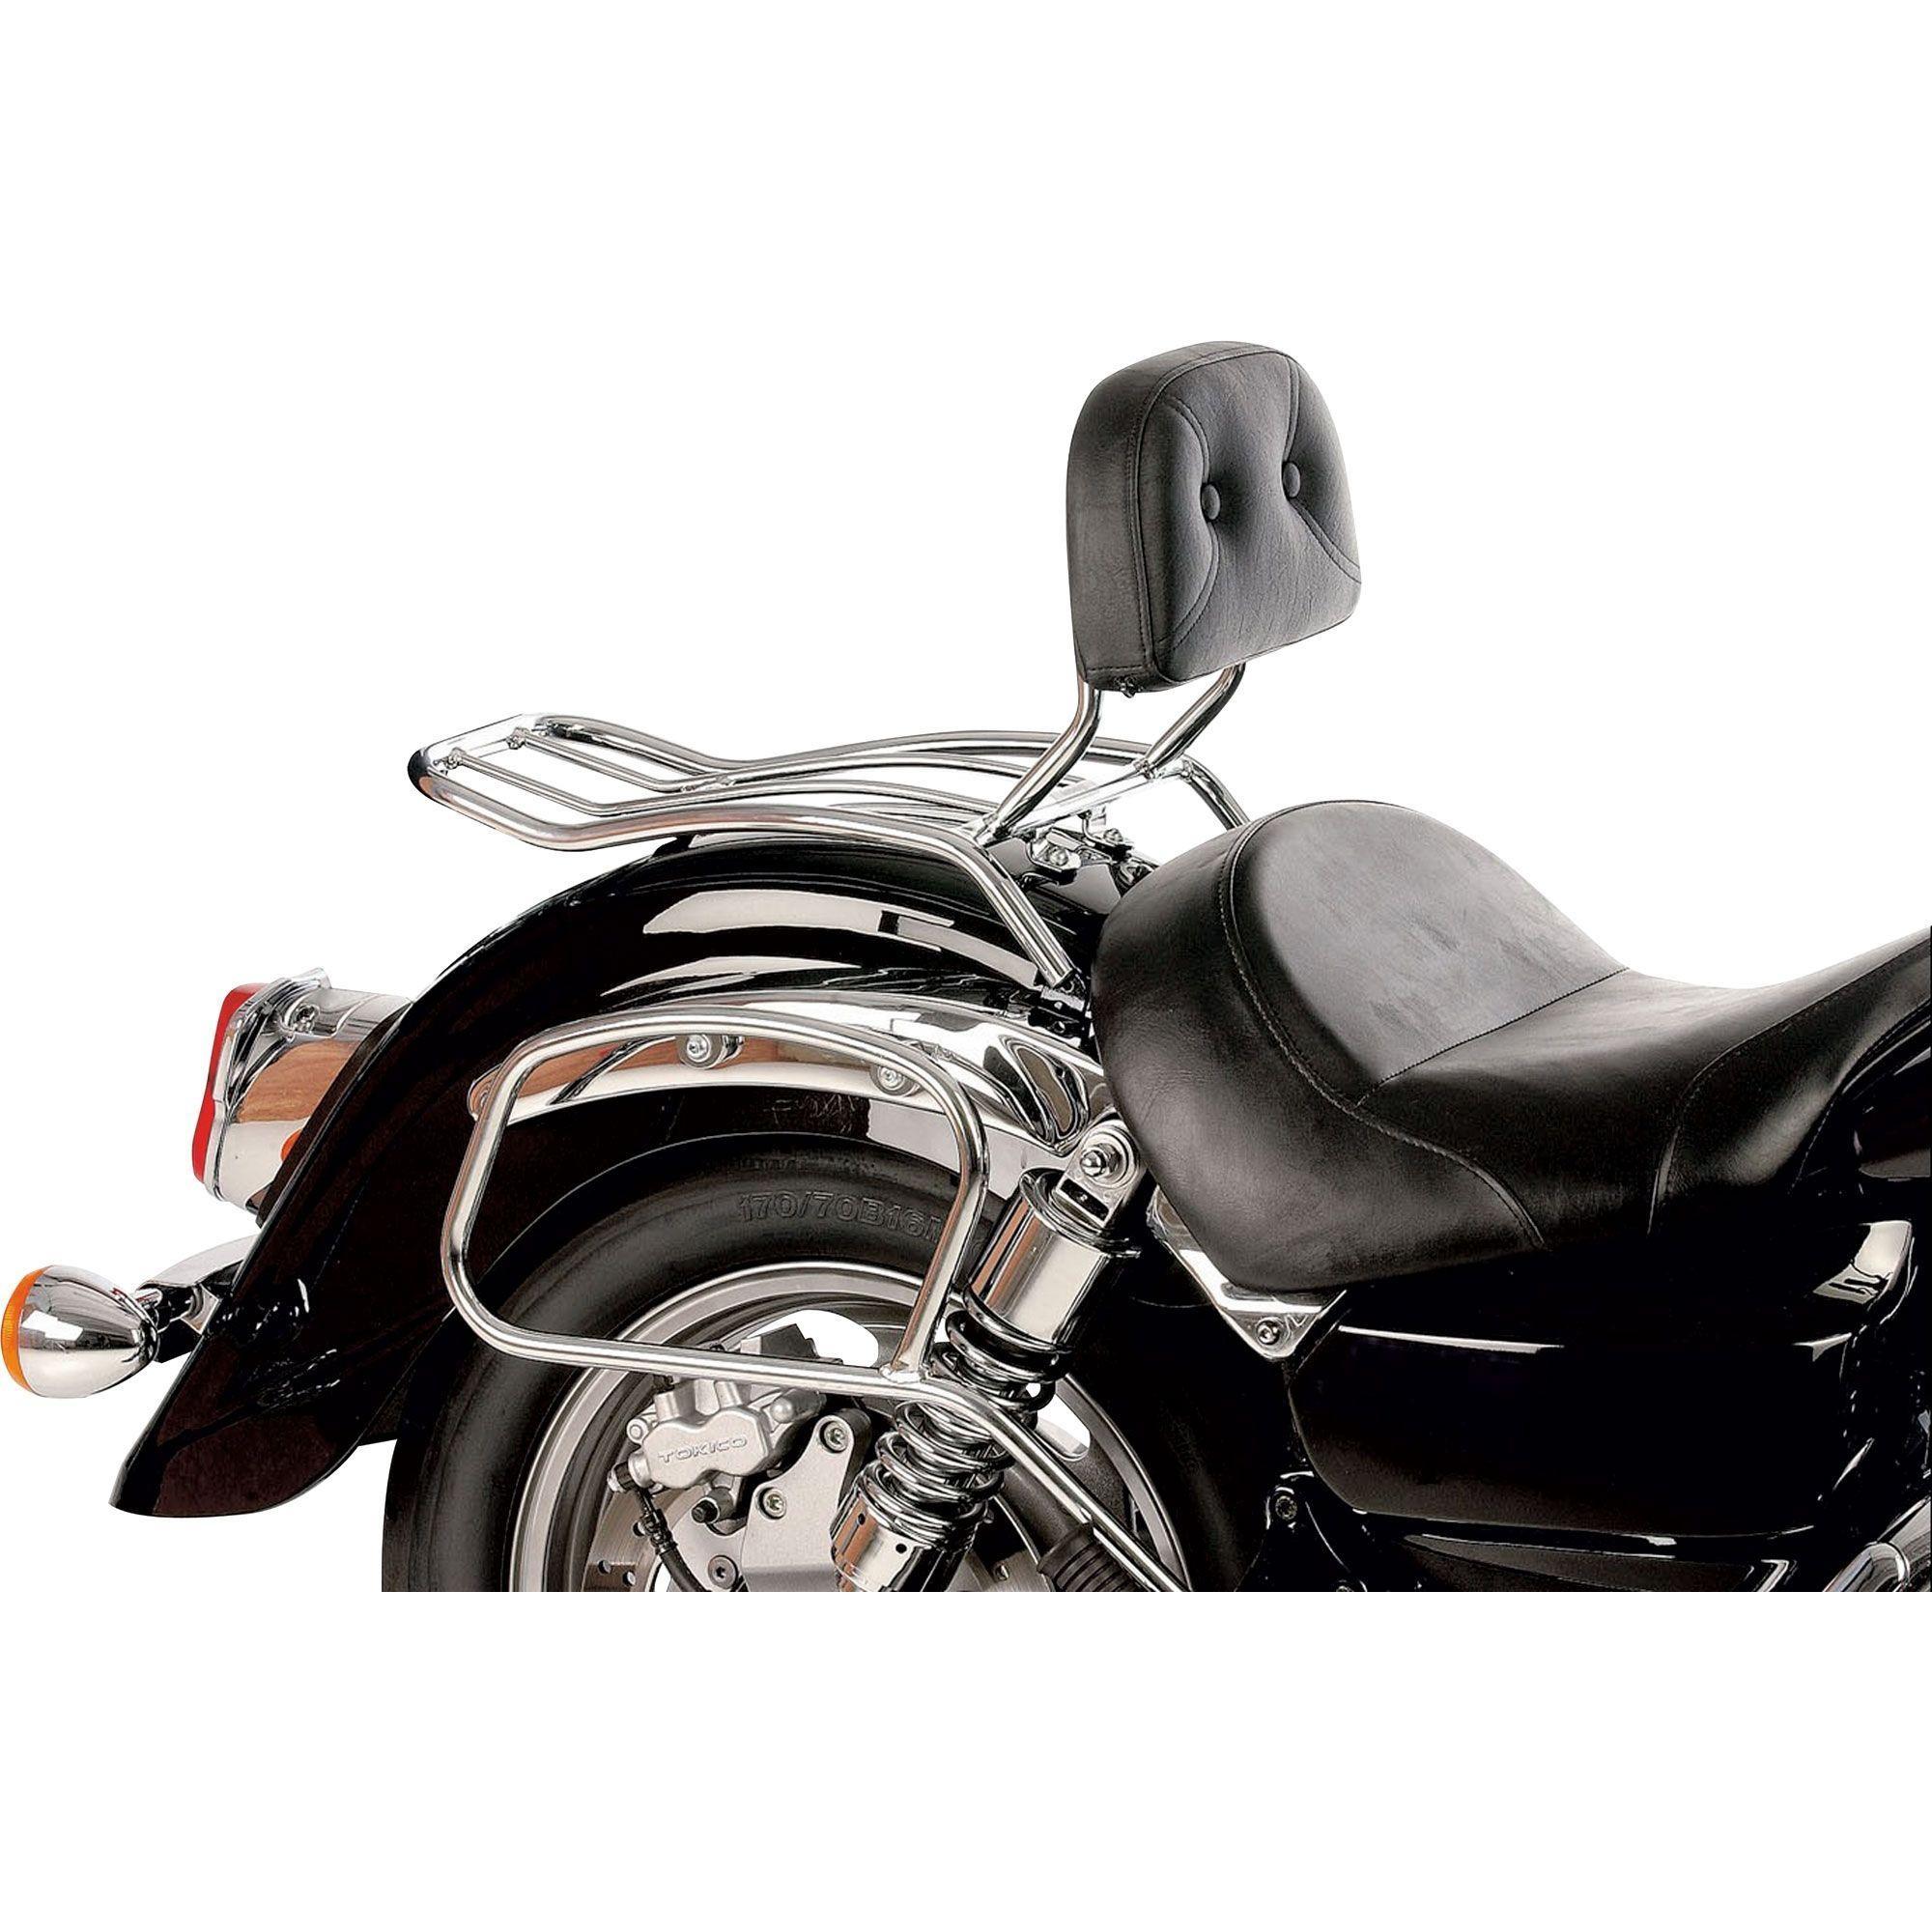 Stelaż na sakwy HEPCO & BECKER do motocykla YAMAHA XVS 1100 DRAG STAR